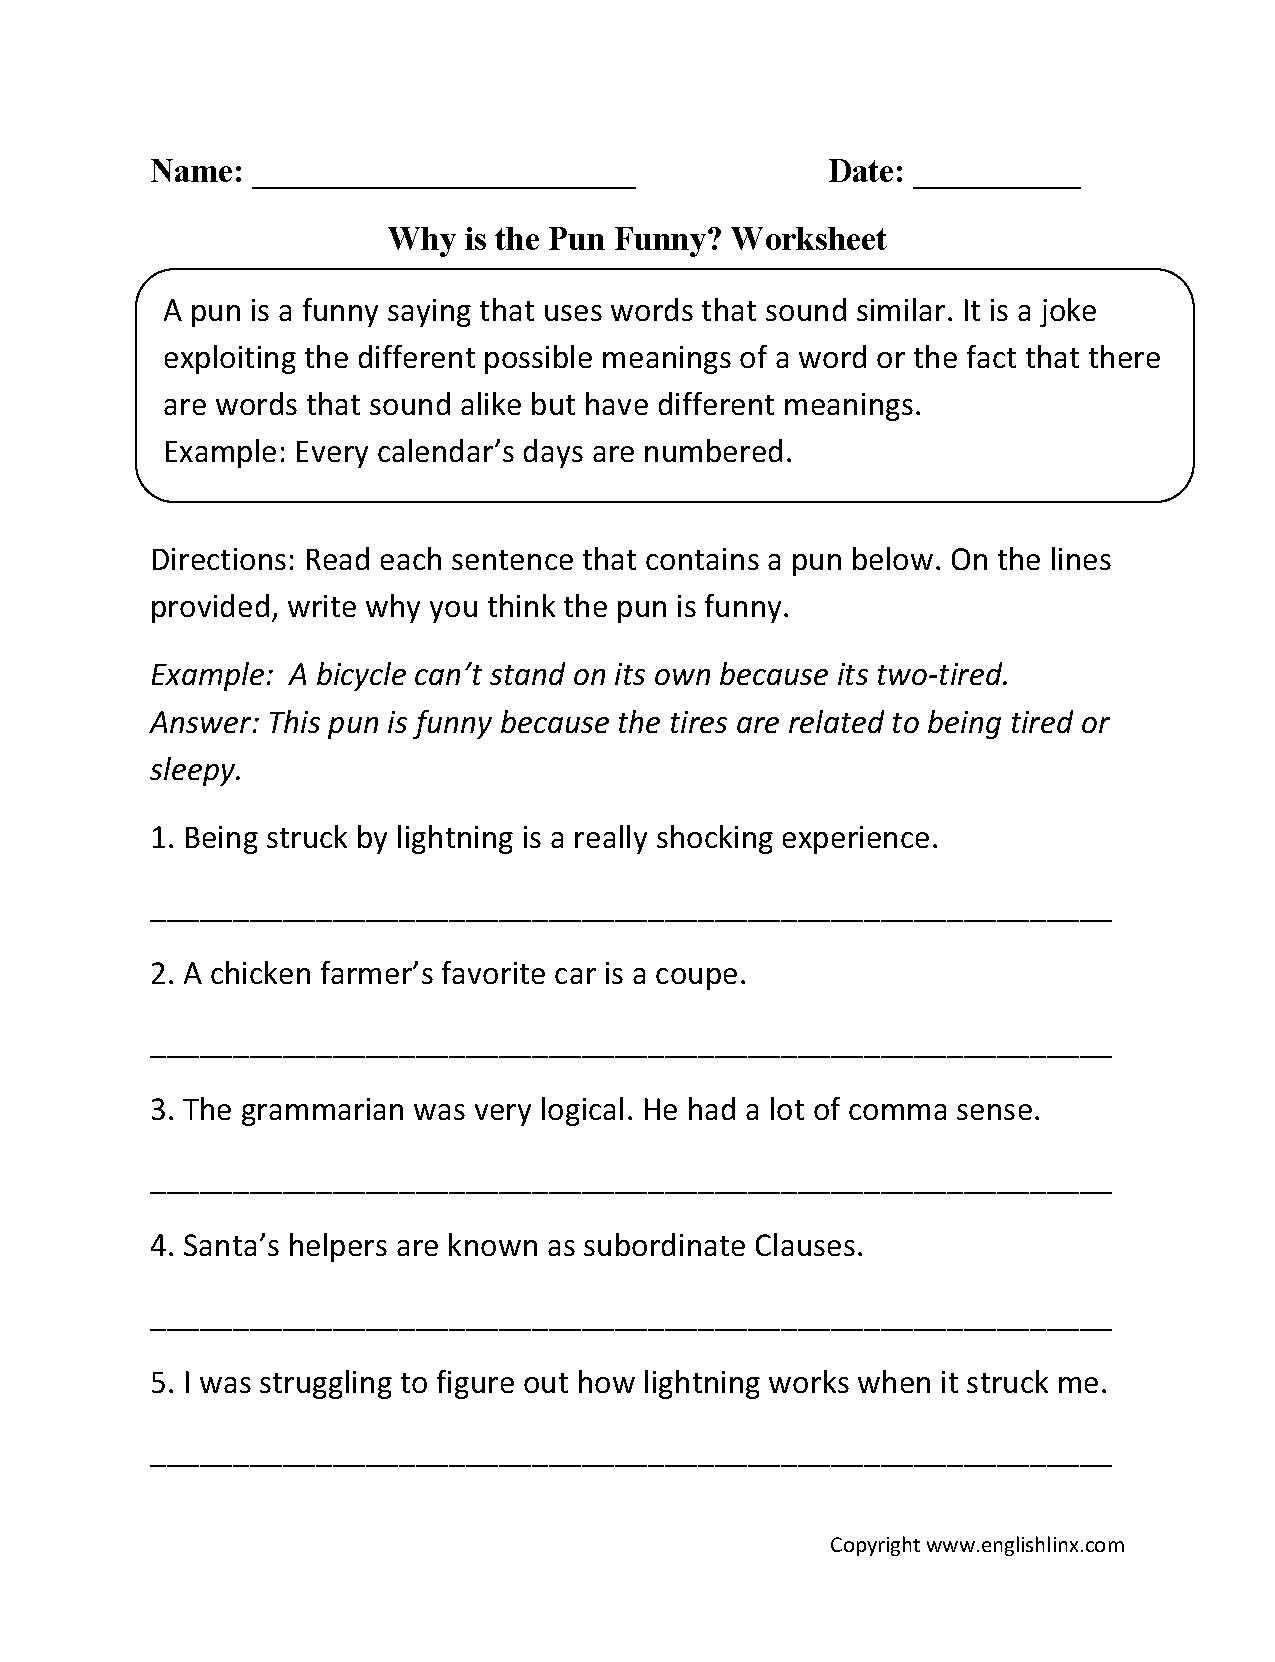 Grammar Worksheets Sentence Fragments Answers